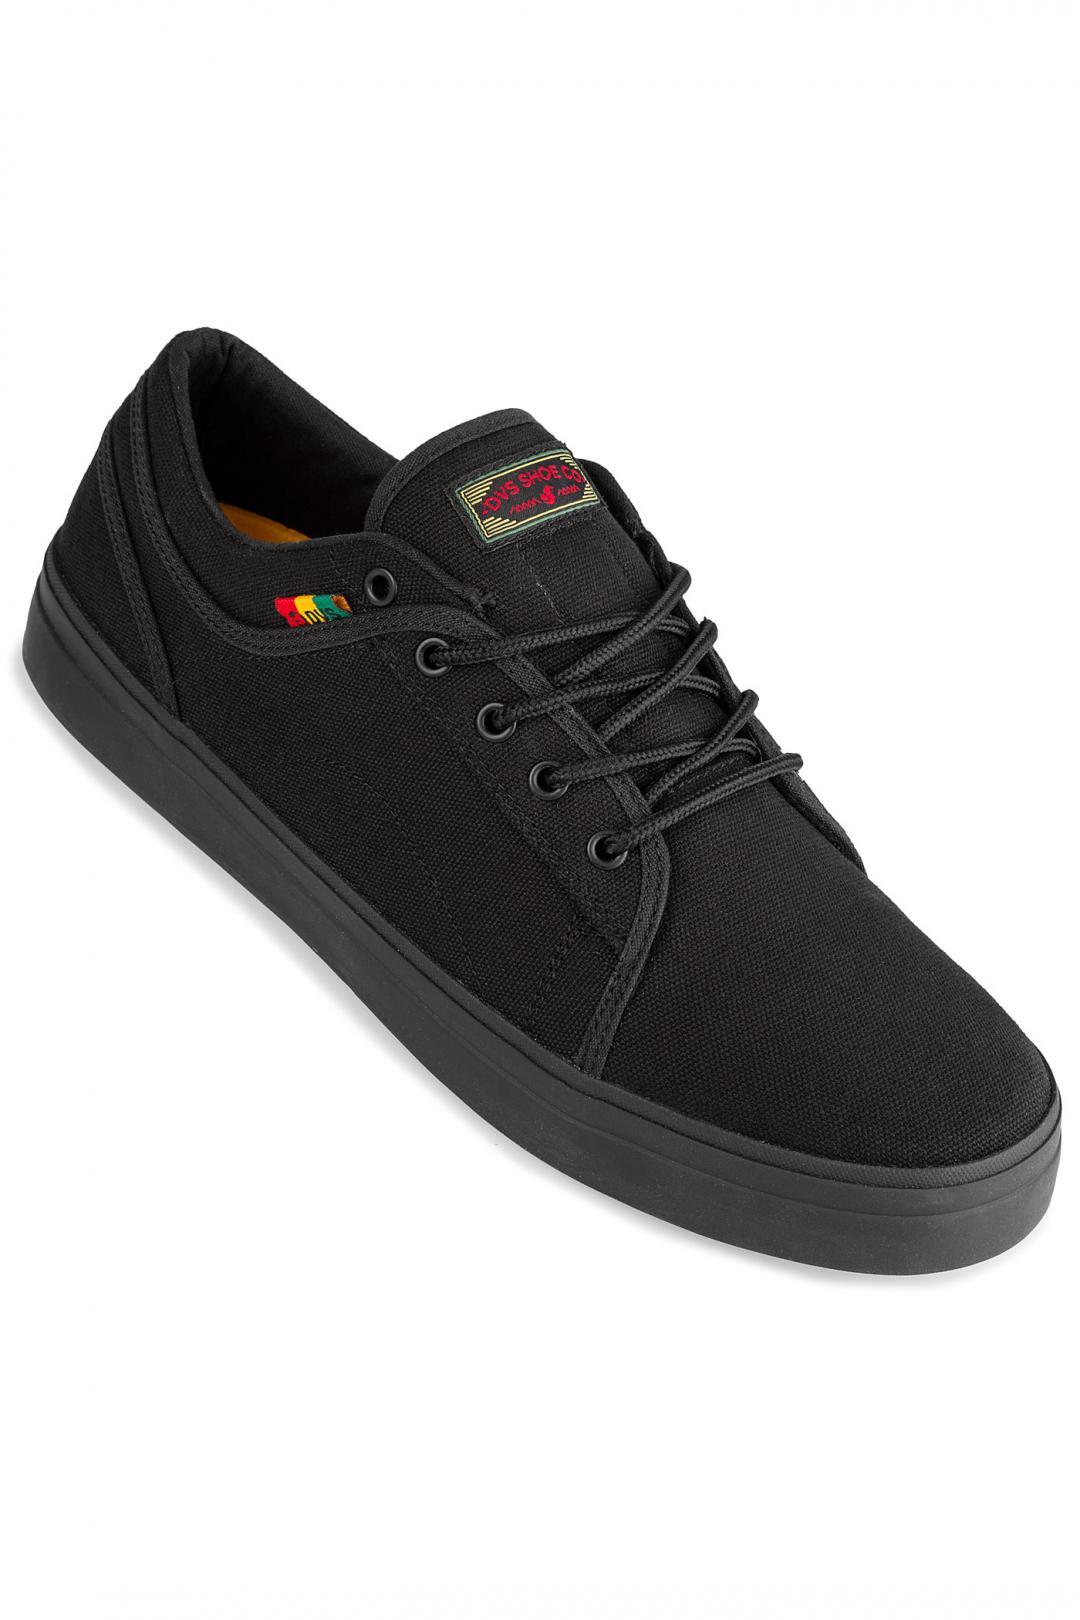 Uomo DVS Aversa+ Canvas black rasta | Sneakers low top